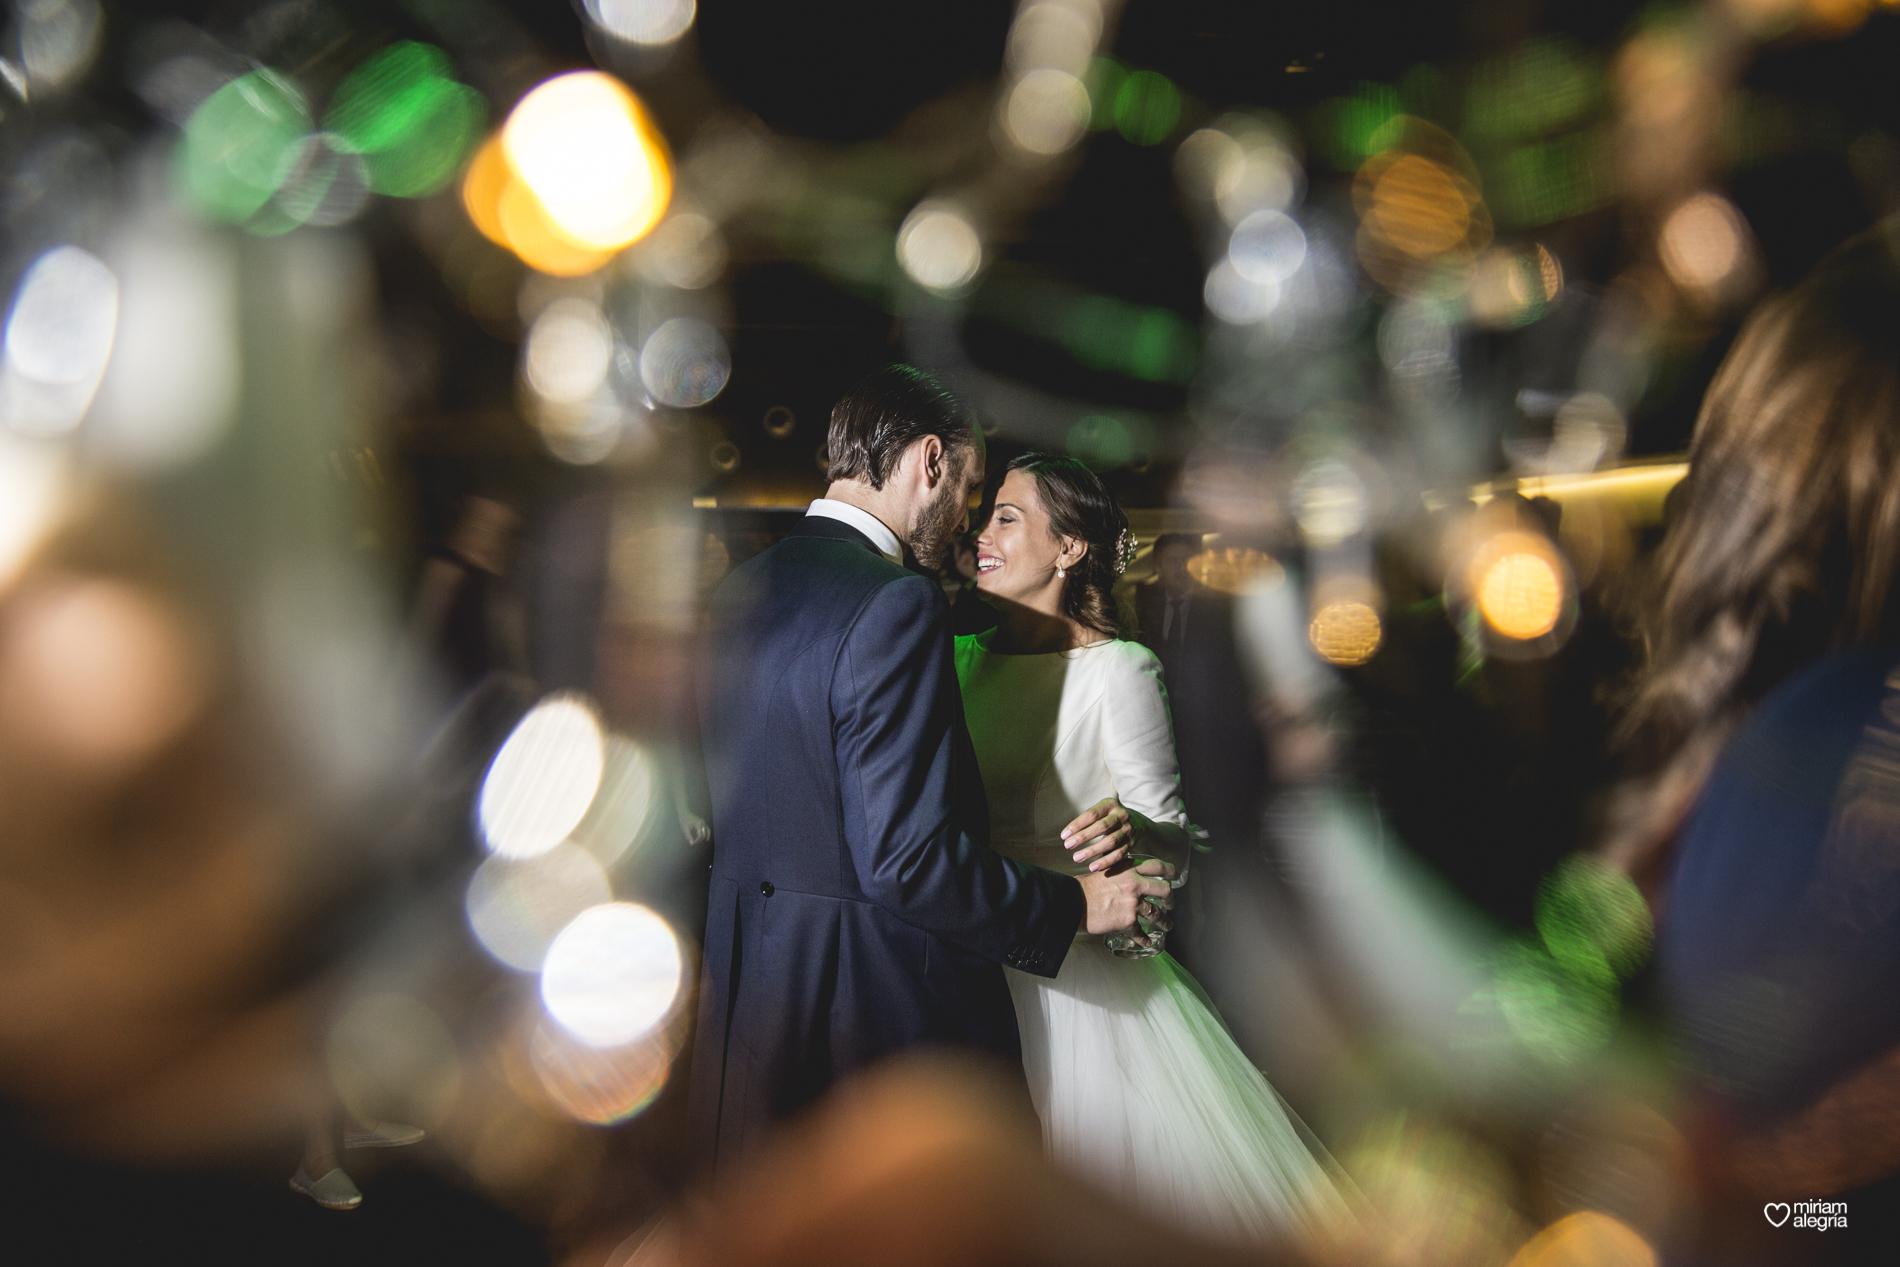 boda-en-la-catedral-de-murcia-miriam-alegria-fotografos-boda-murcia-85